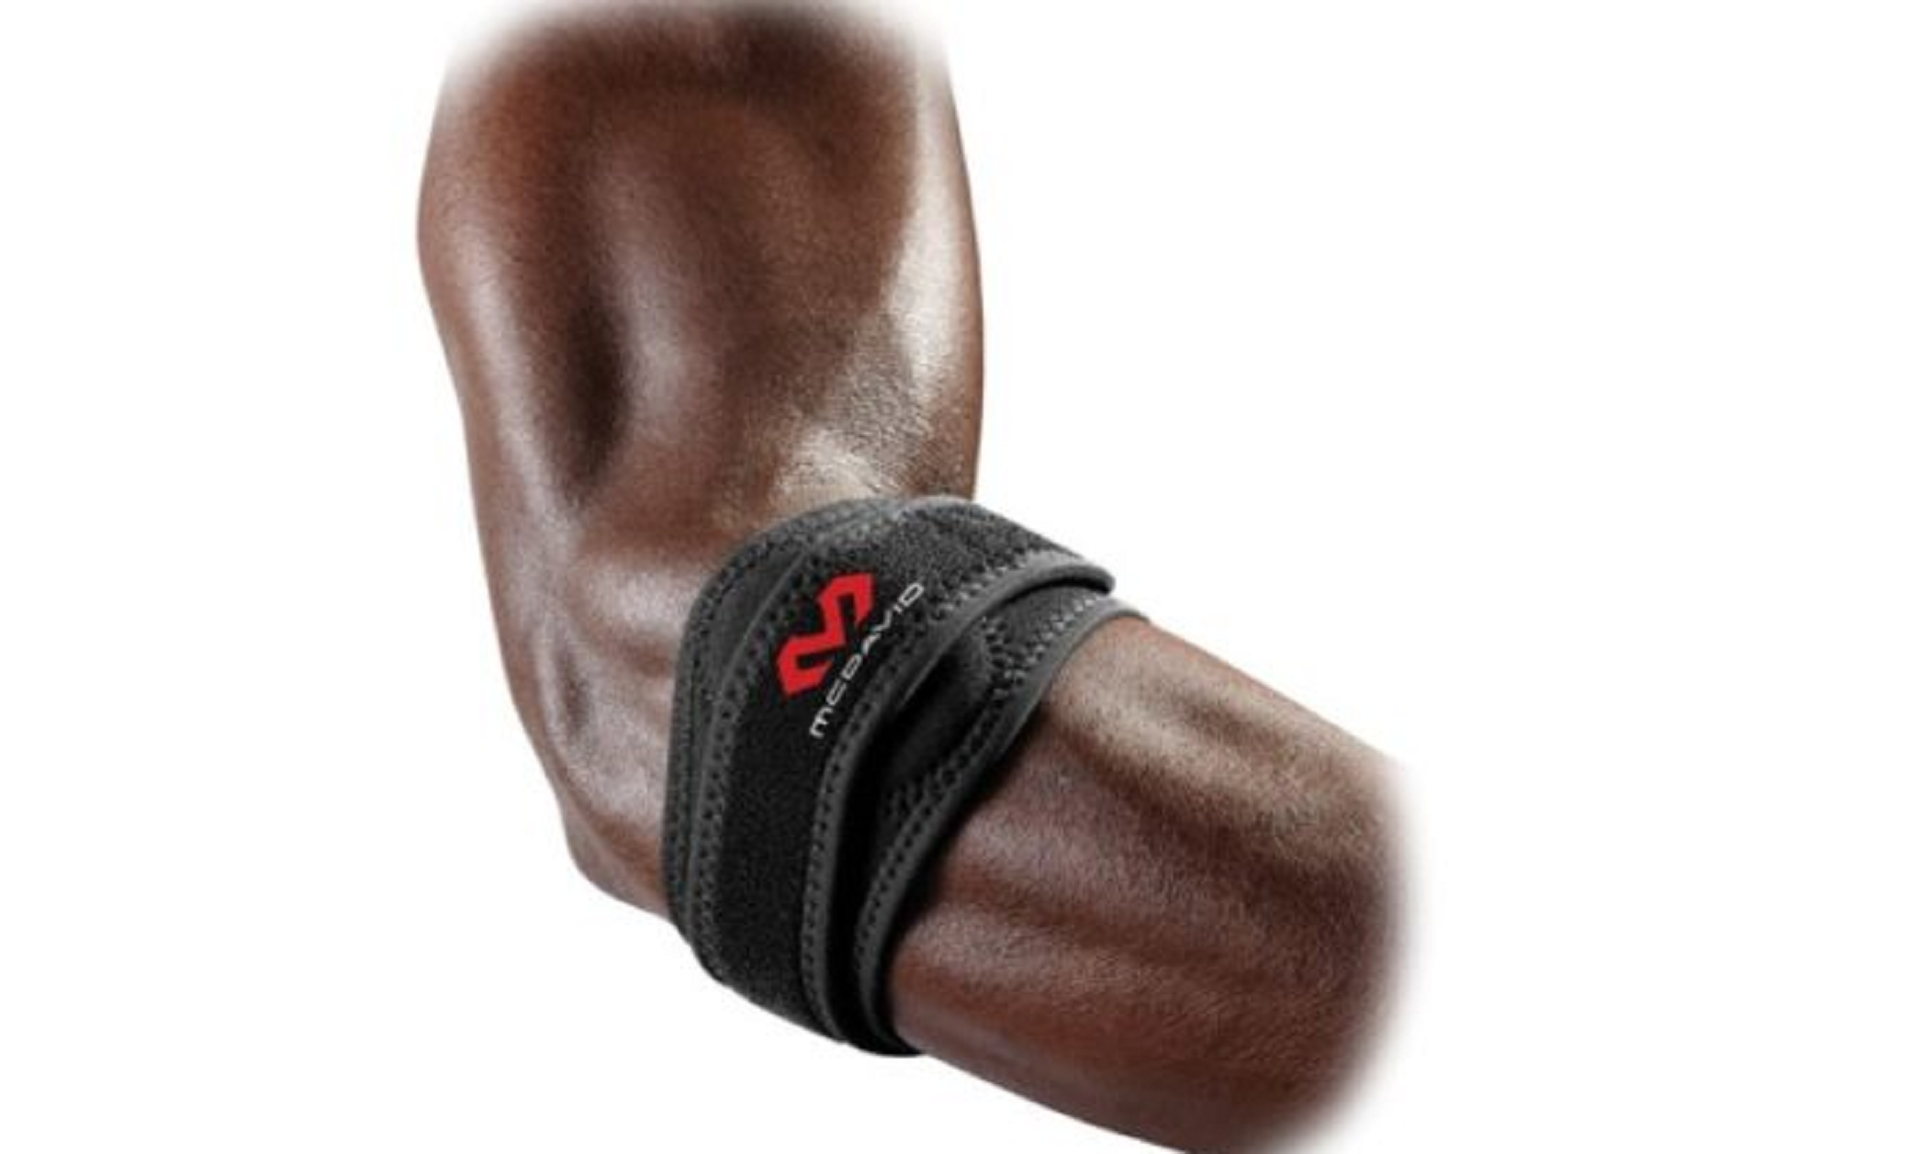 mcdavid 489 elbow straps